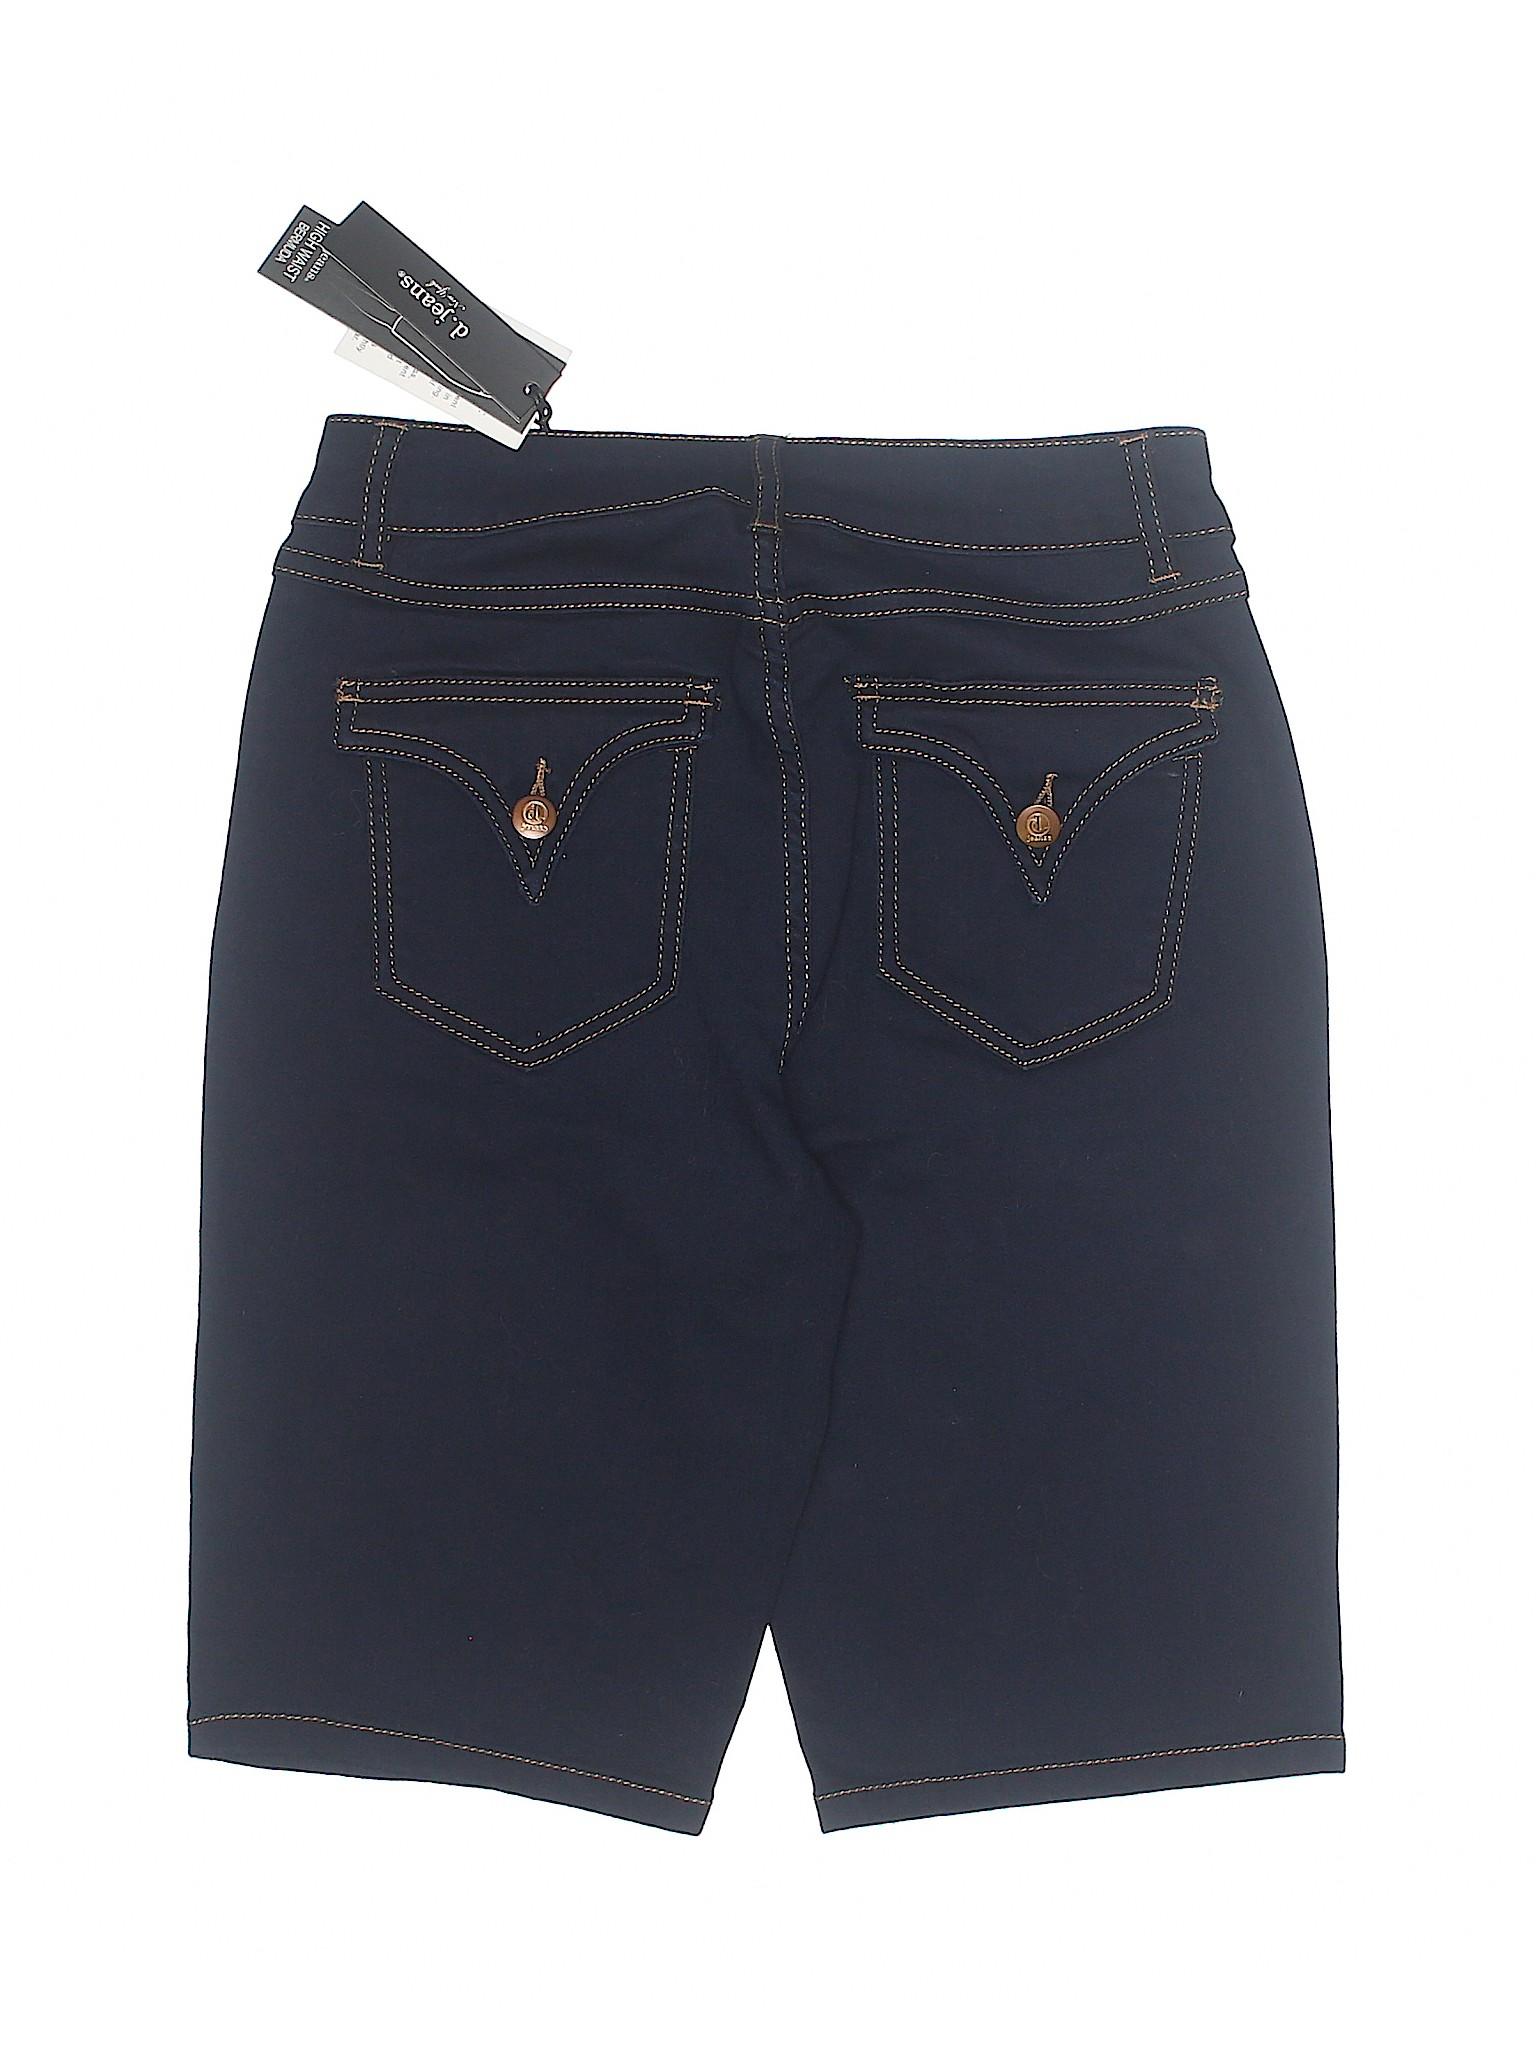 Boutique Denim Denim Denim Boutique Jeans D Boutique Shorts Jeans D Shorts Boutique Shorts D Jeans aTxC4ZwCqS